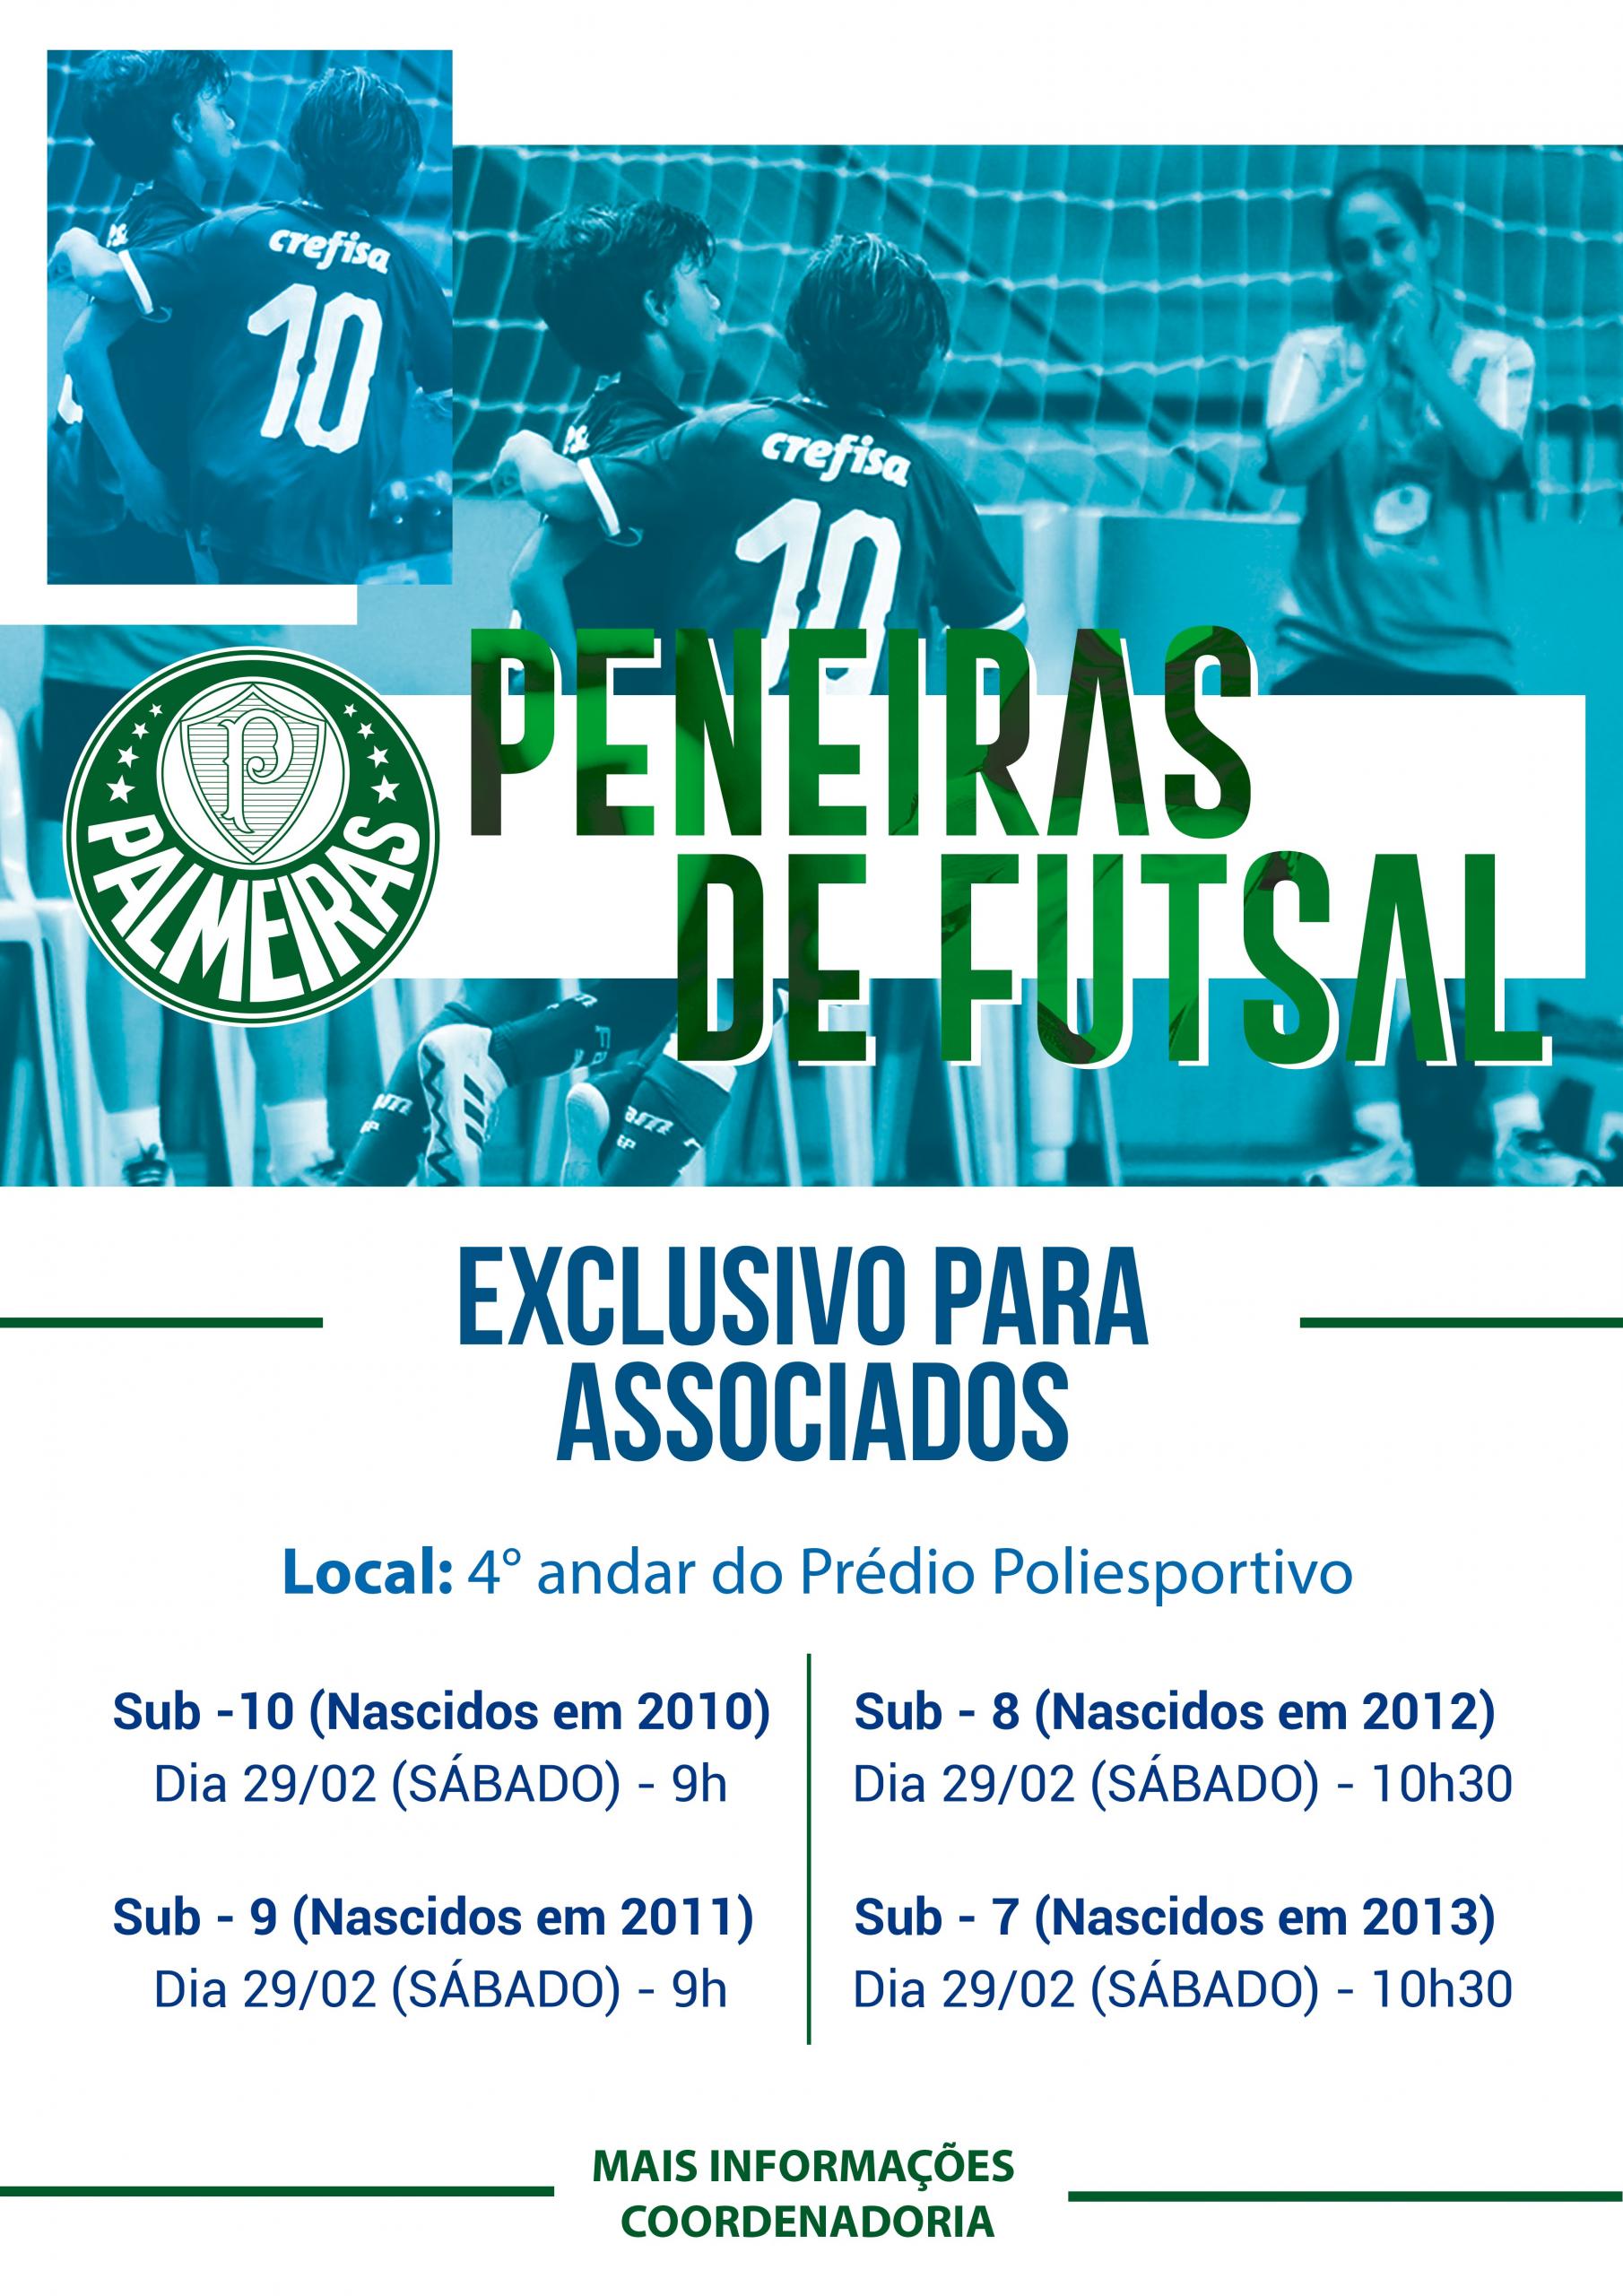 037 CSD Peneiras Futsal NOVO